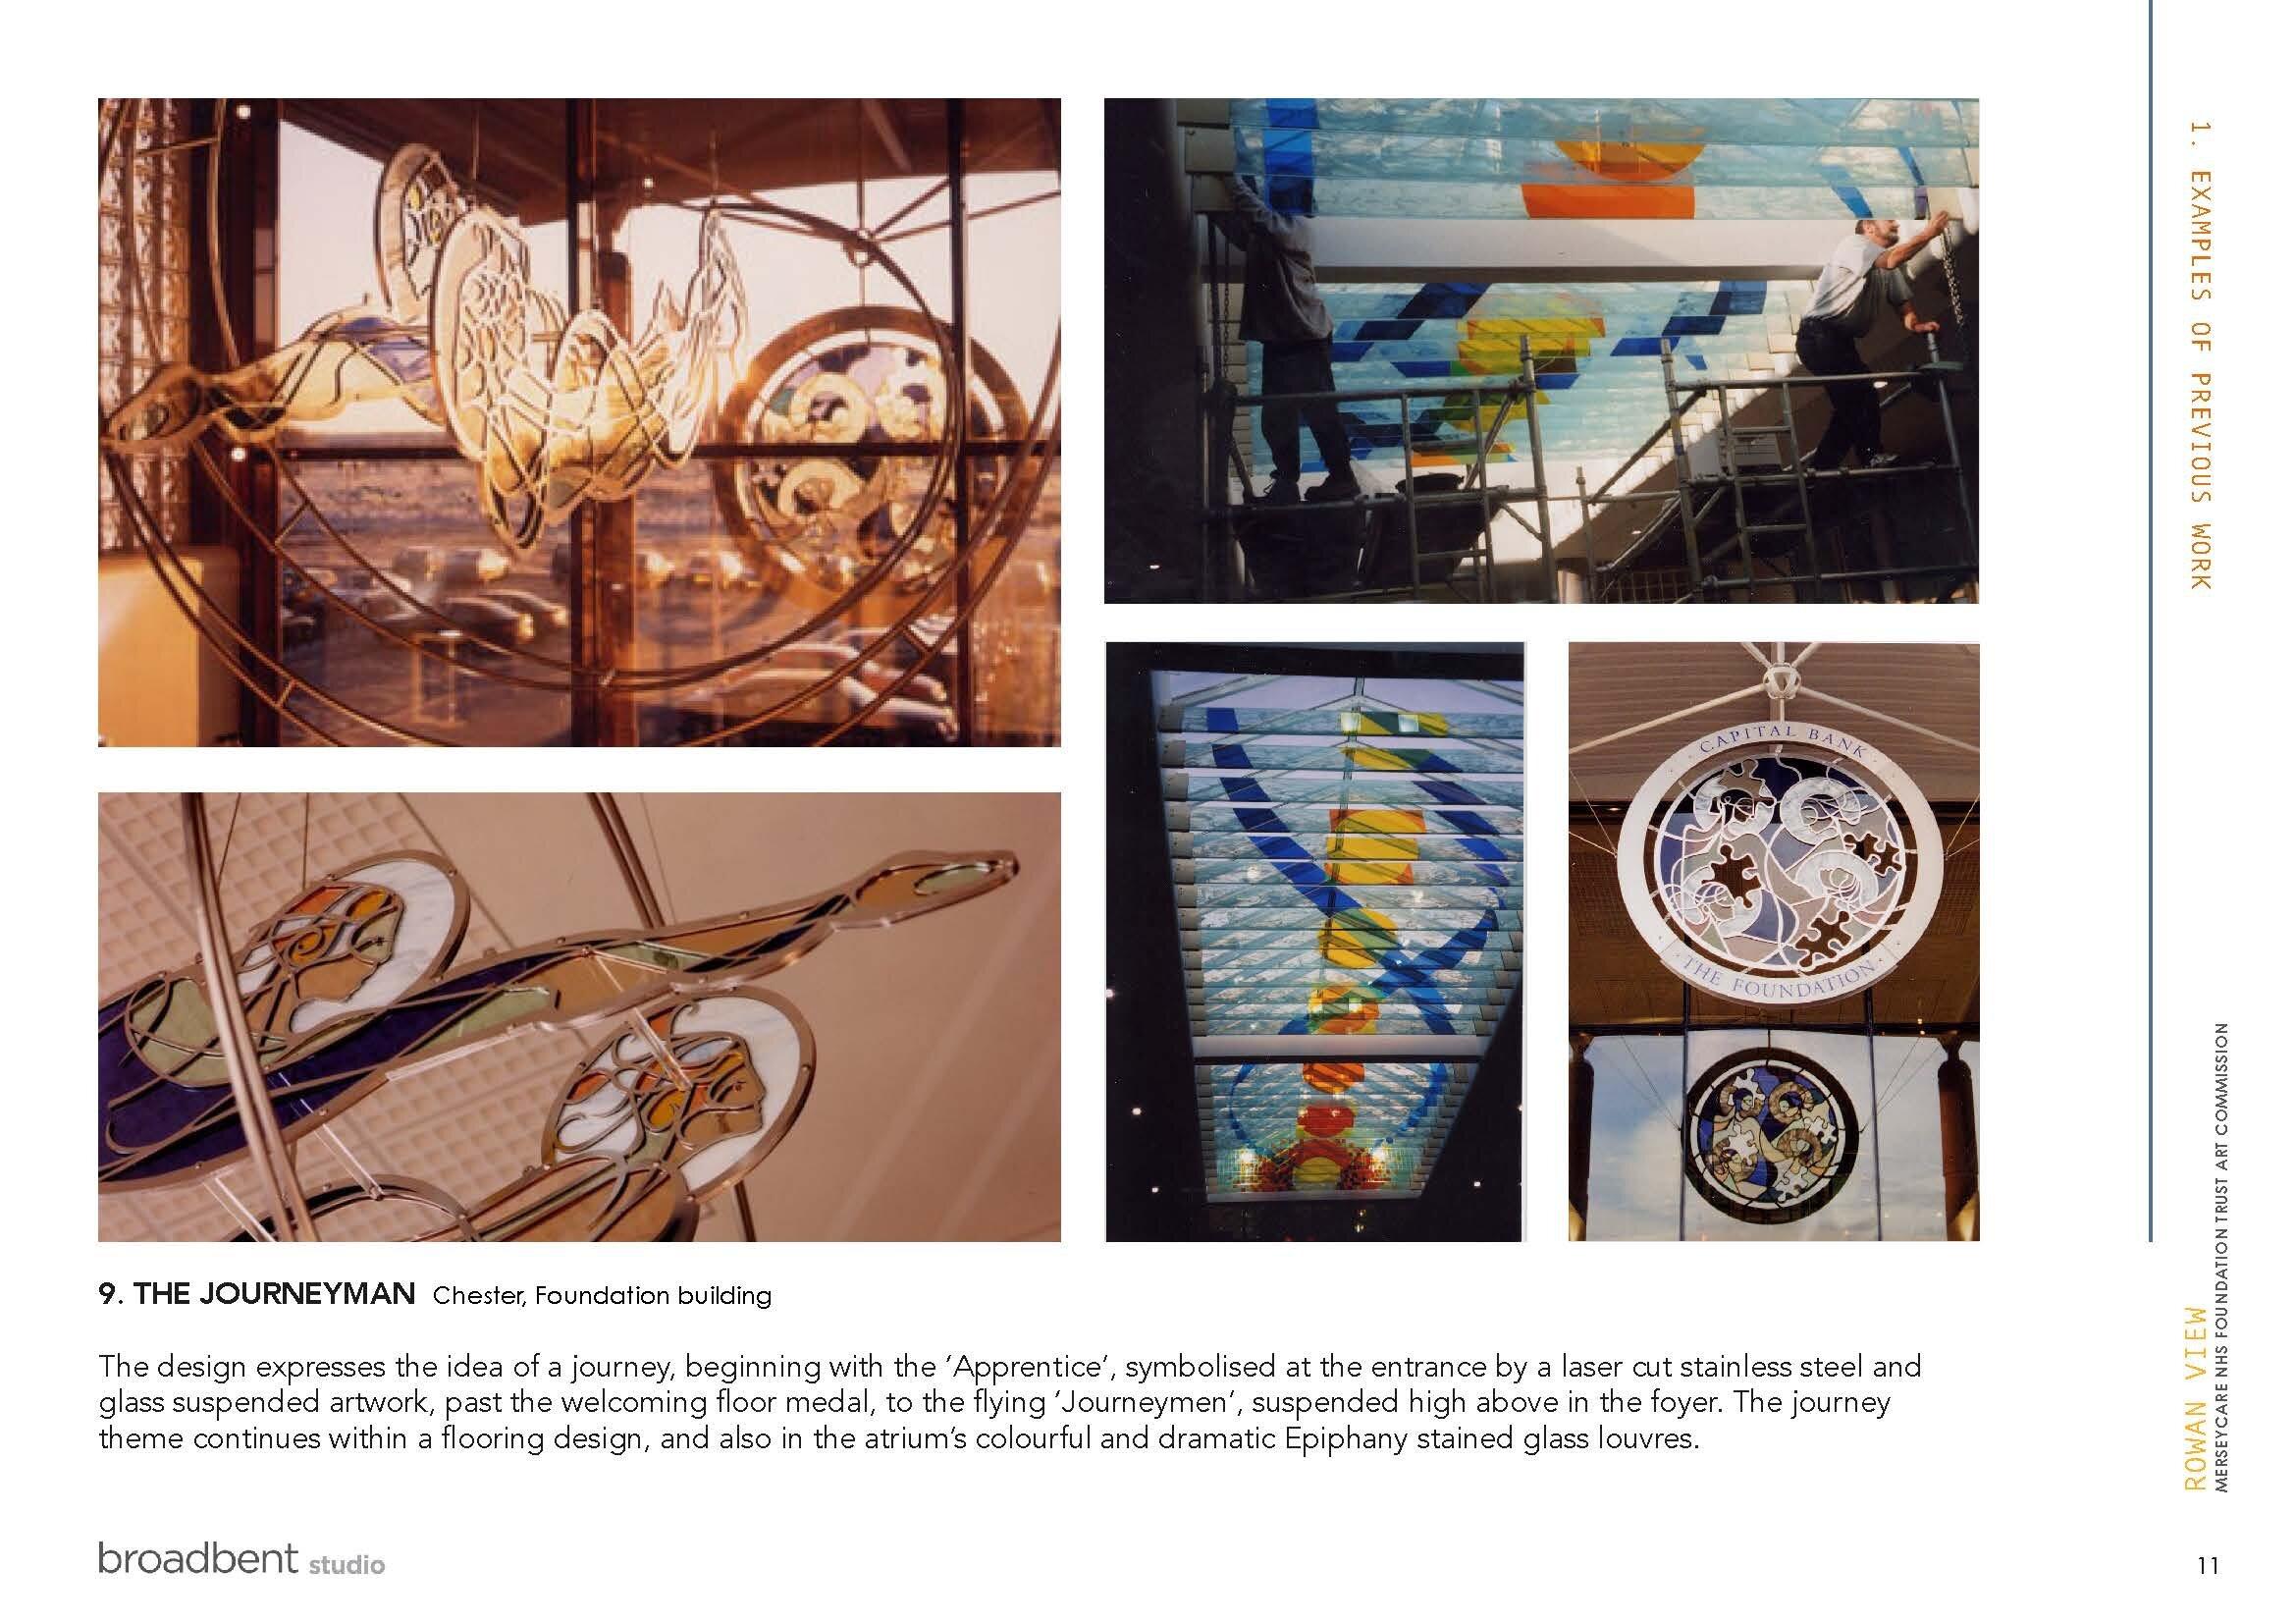 Broadbent Studio - Image 9.jpg